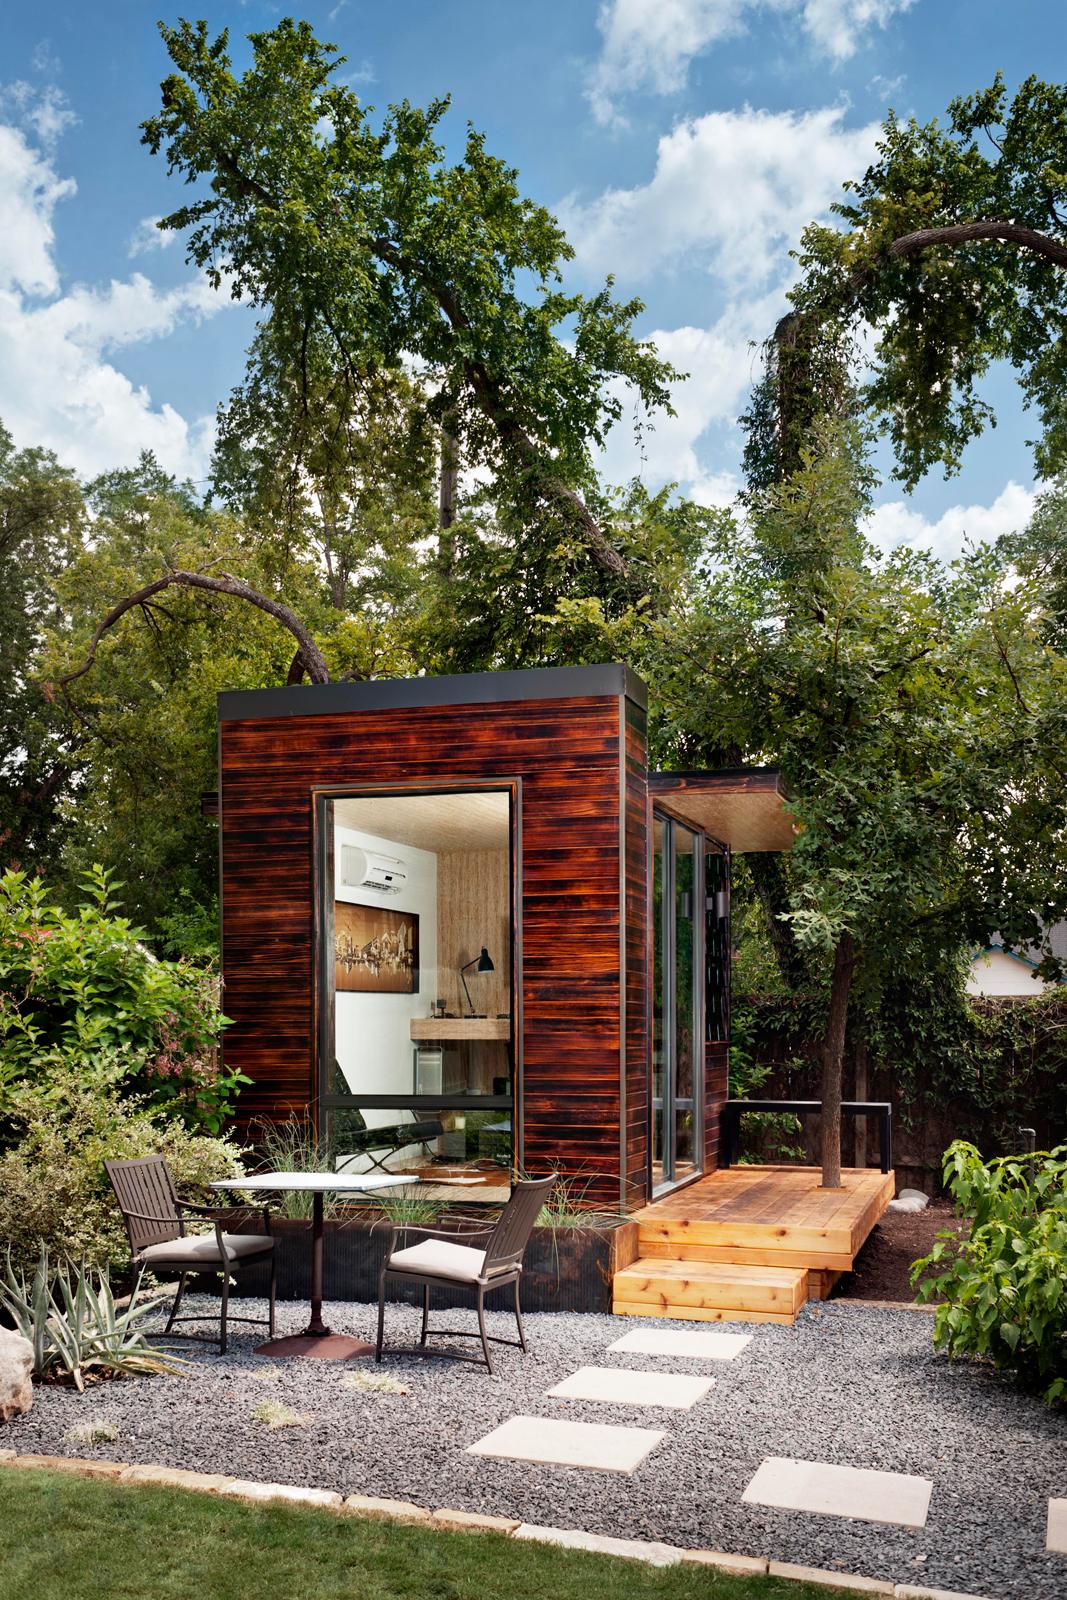 Modern prefab home by Sett Studio